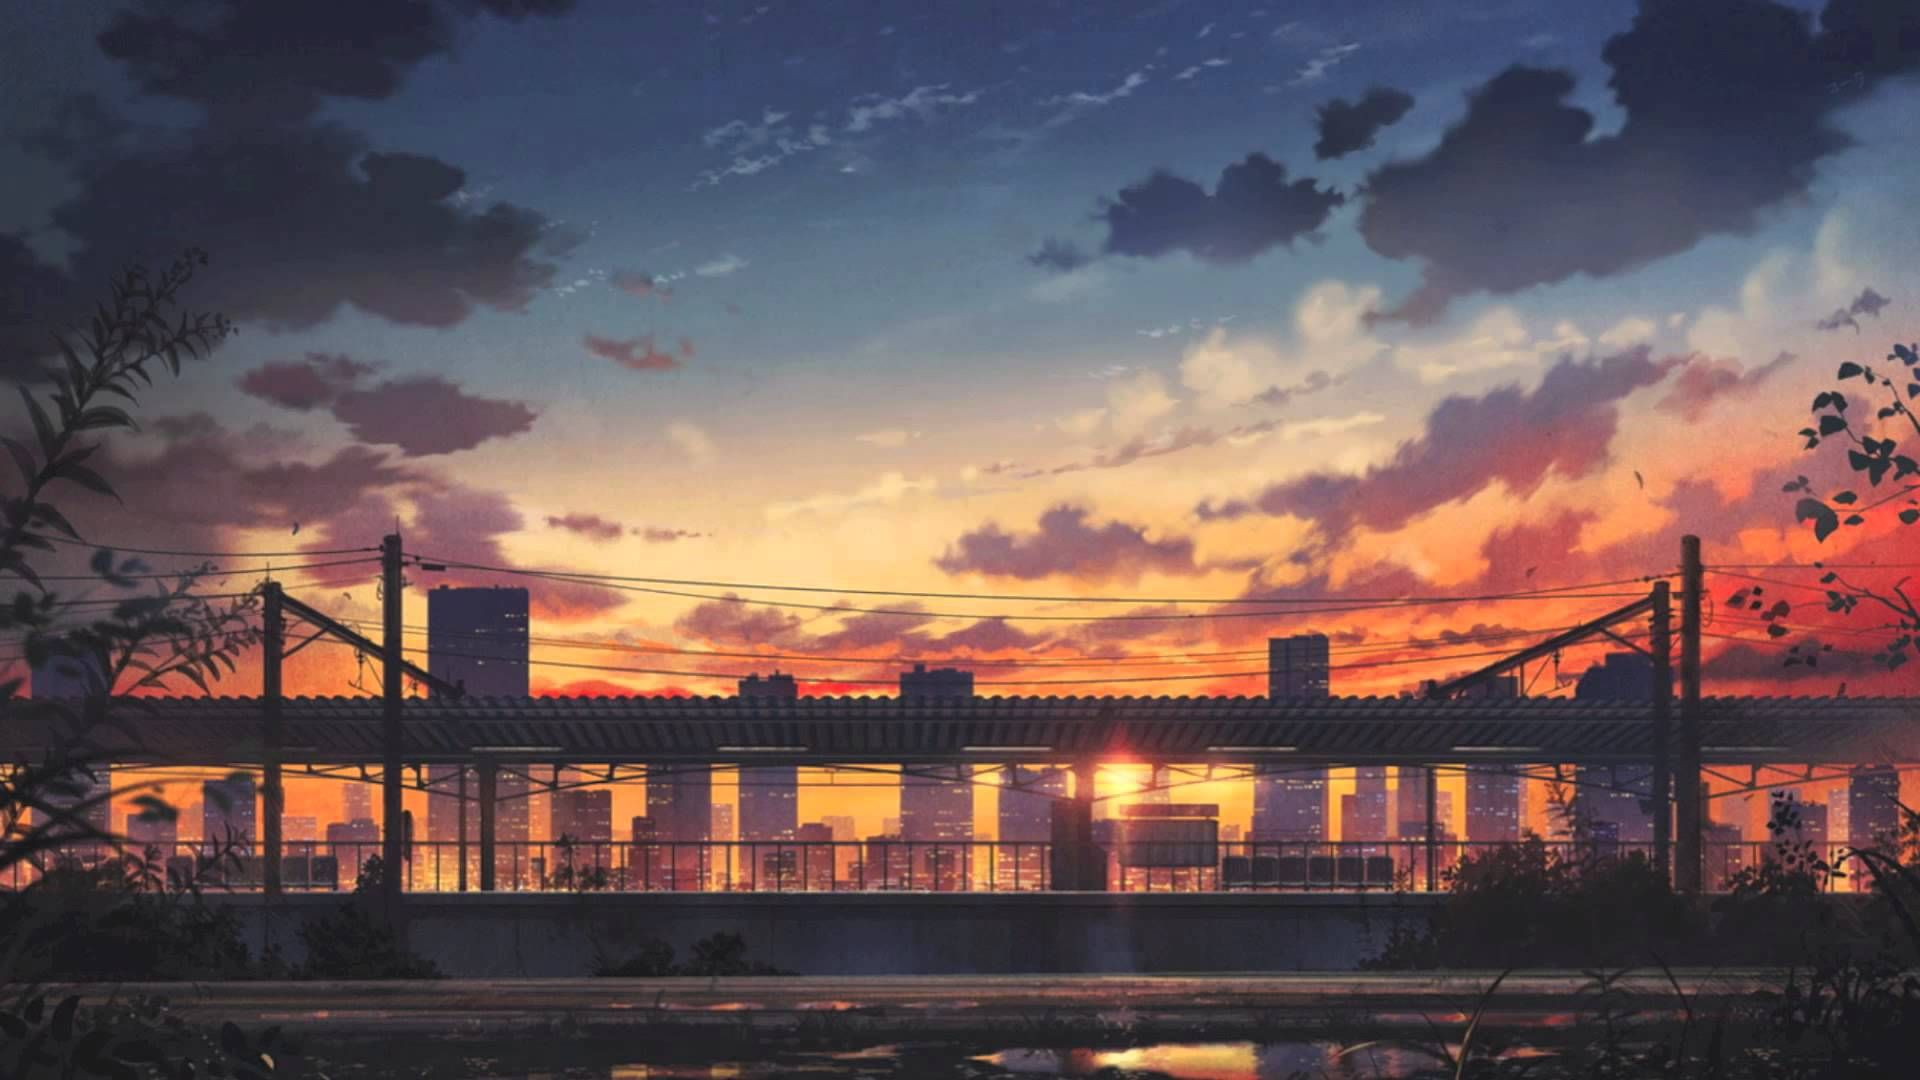 Asa Send Me A Sign (feat. Koo) Anime scenery, Scenery